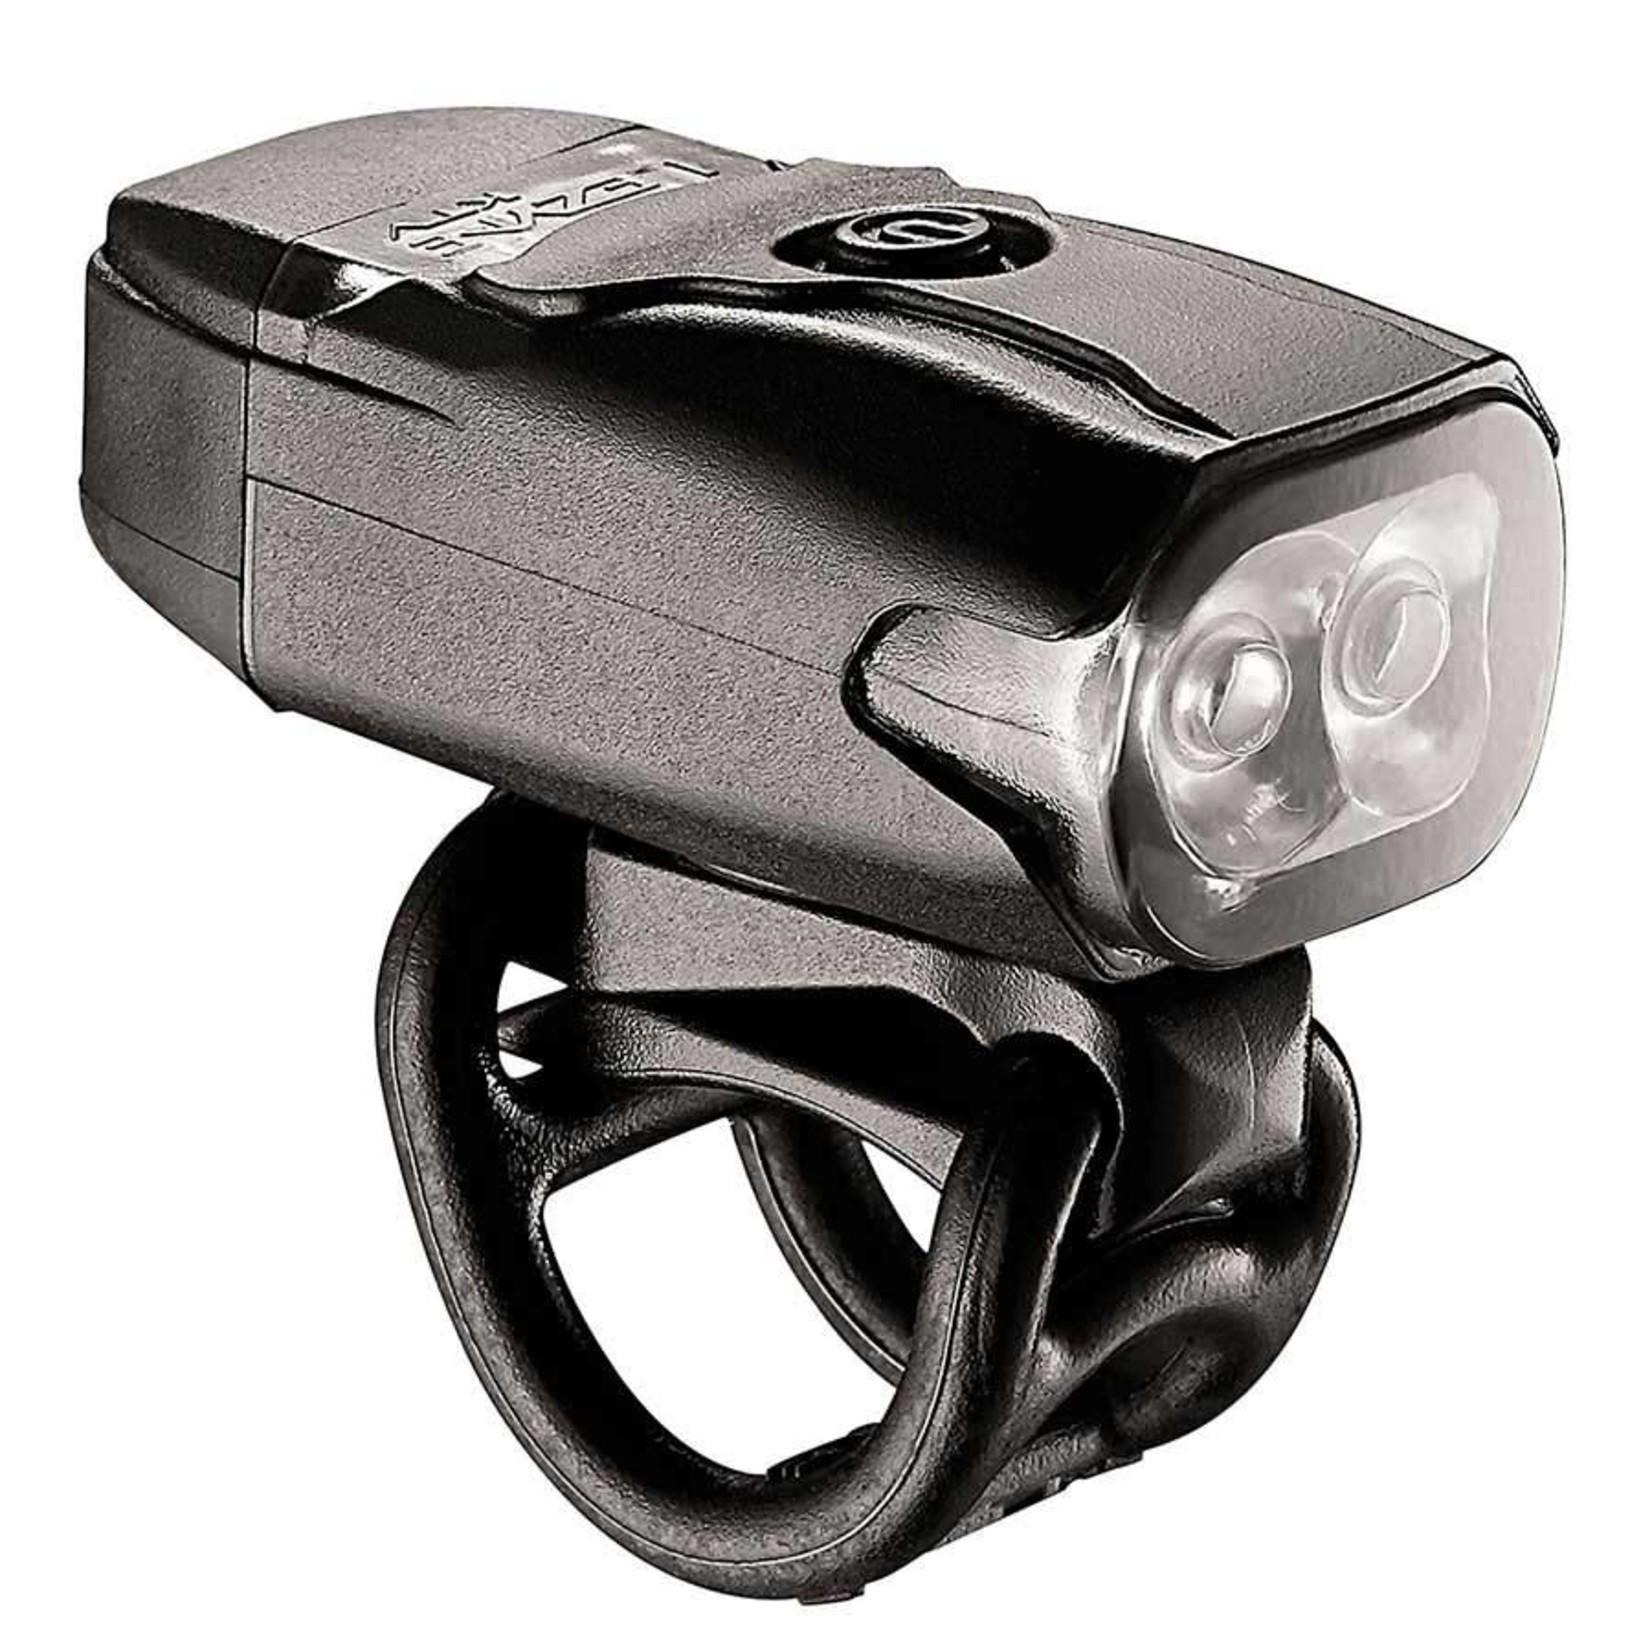 Lezyne Lezyne KTV Drive Headlight